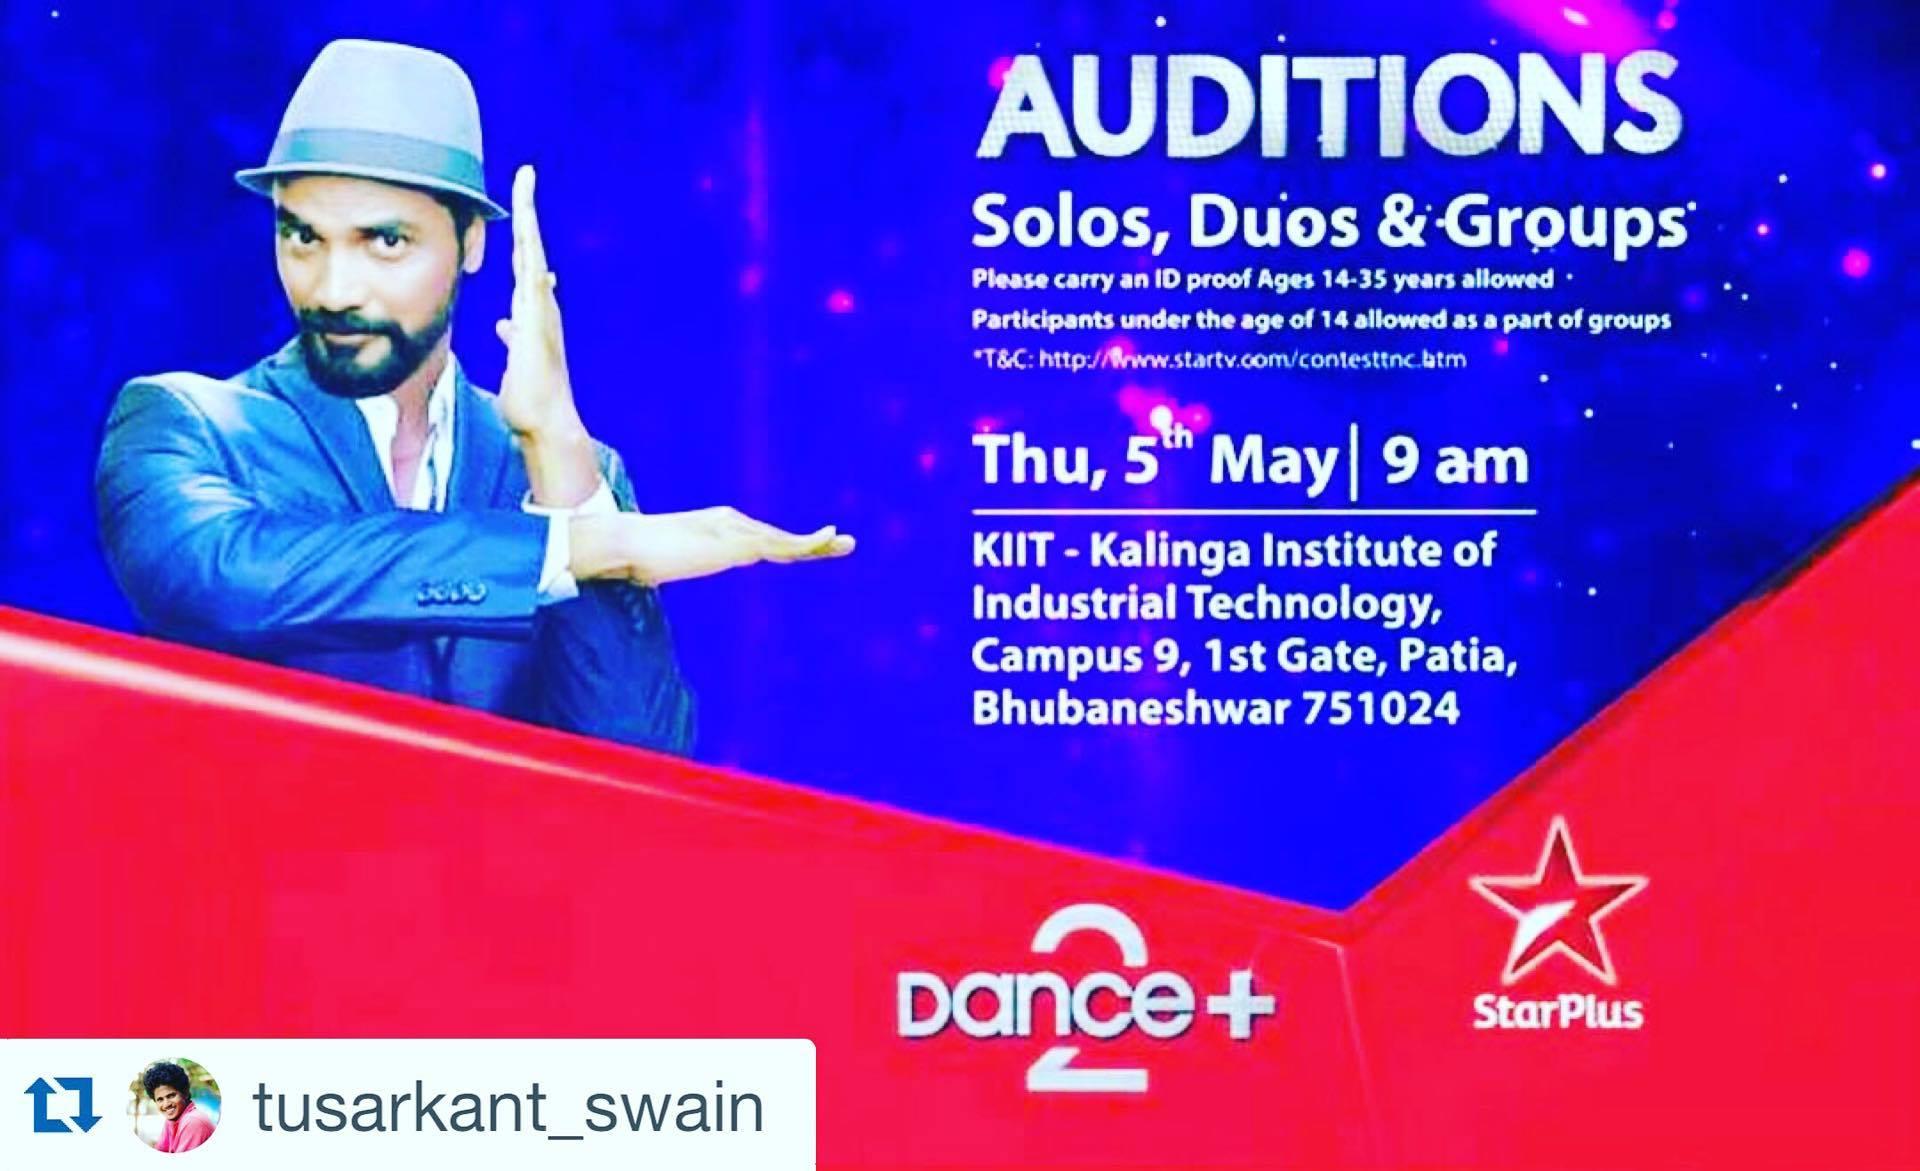 Star plus Dance plus audition bhubaneswar buzz2